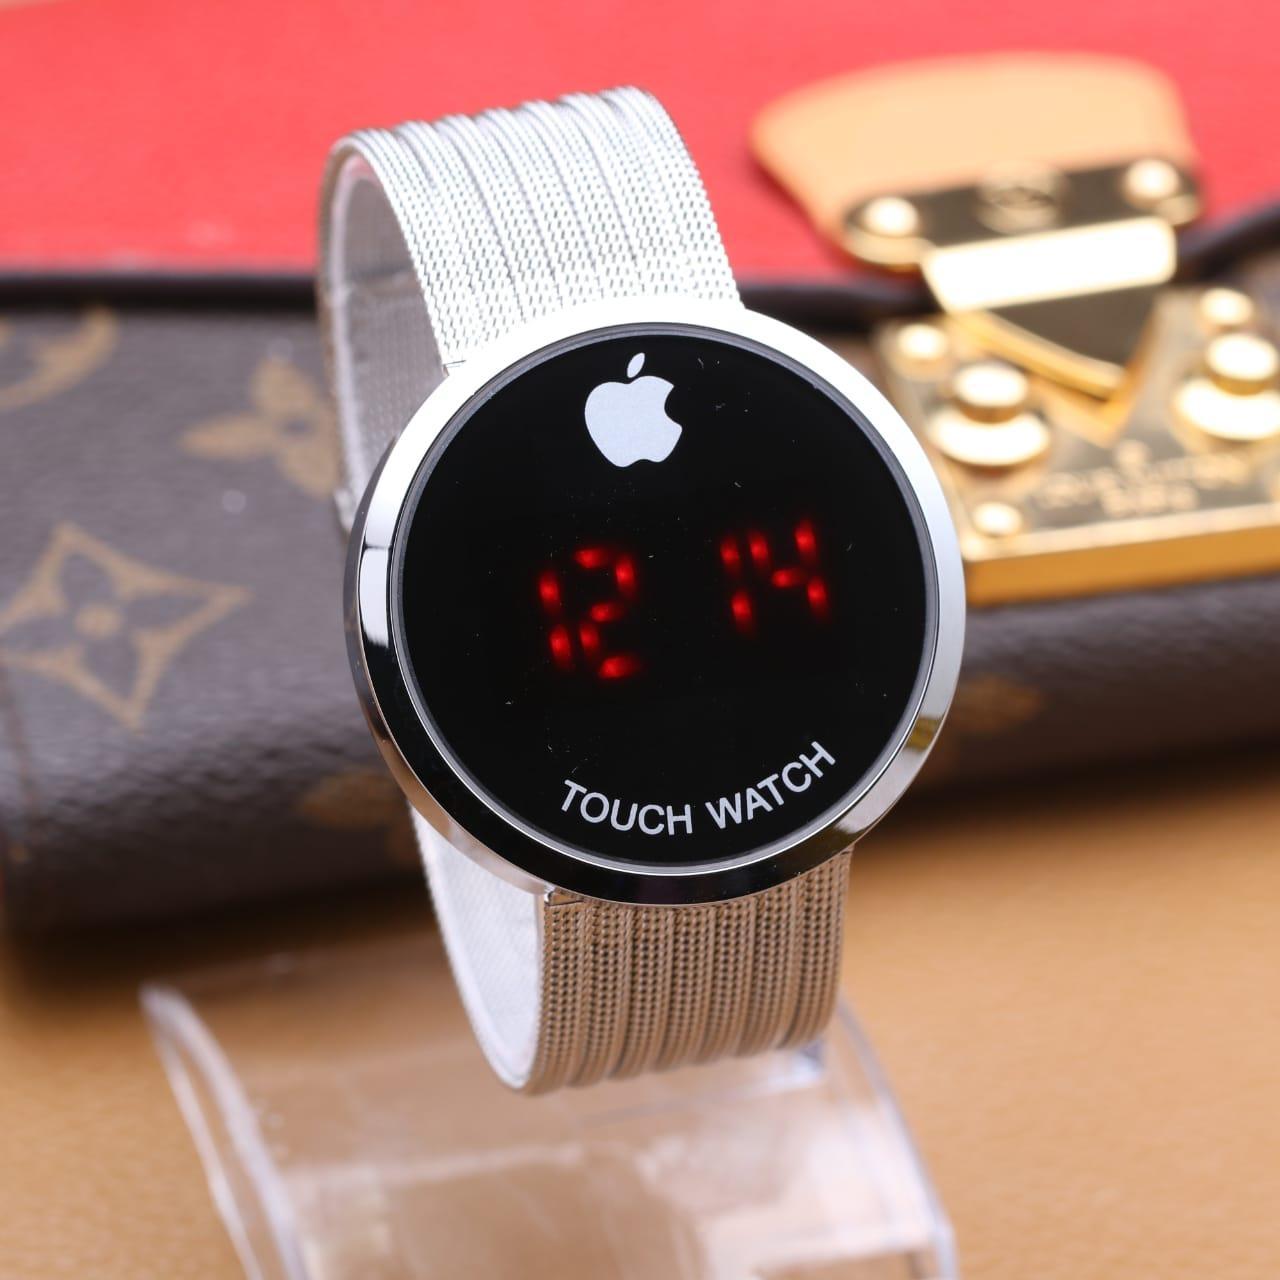 Jam Tangan Wanita Digital Layar Sentuh Apple / Watch Digital Apple 1